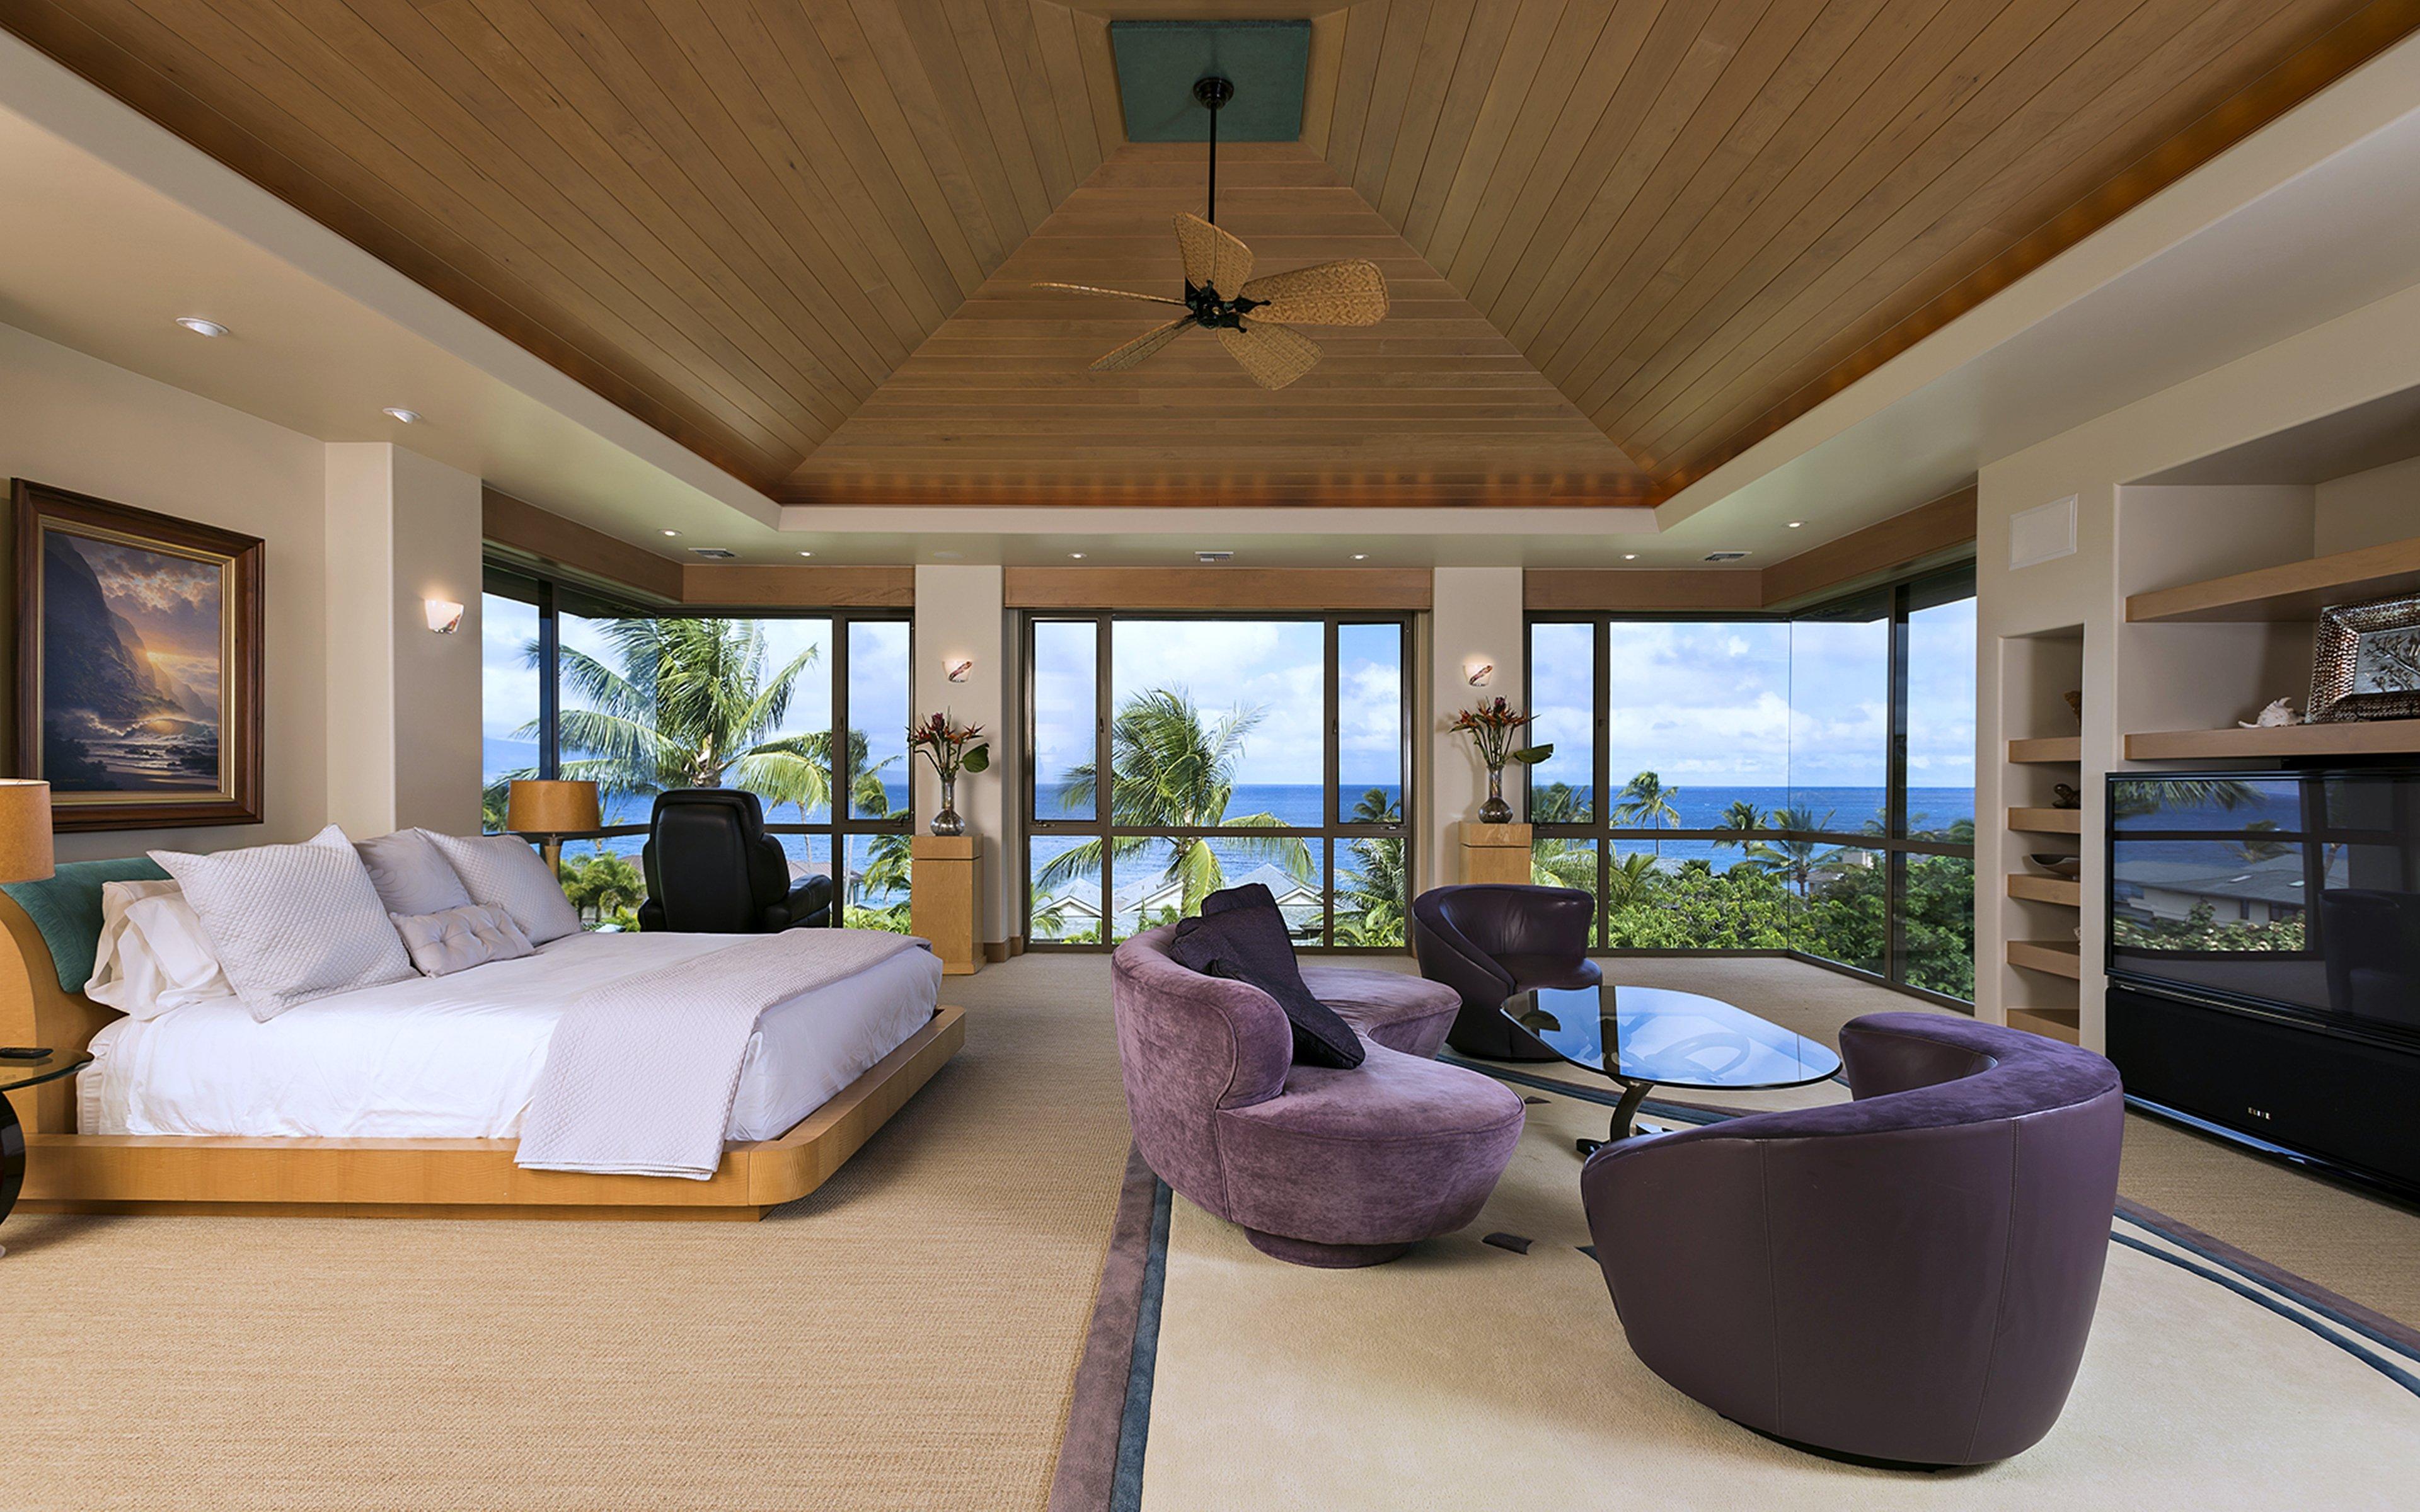 Maui Hawaii Bedroom Home Luxury Pacific Ocean Sea Interior